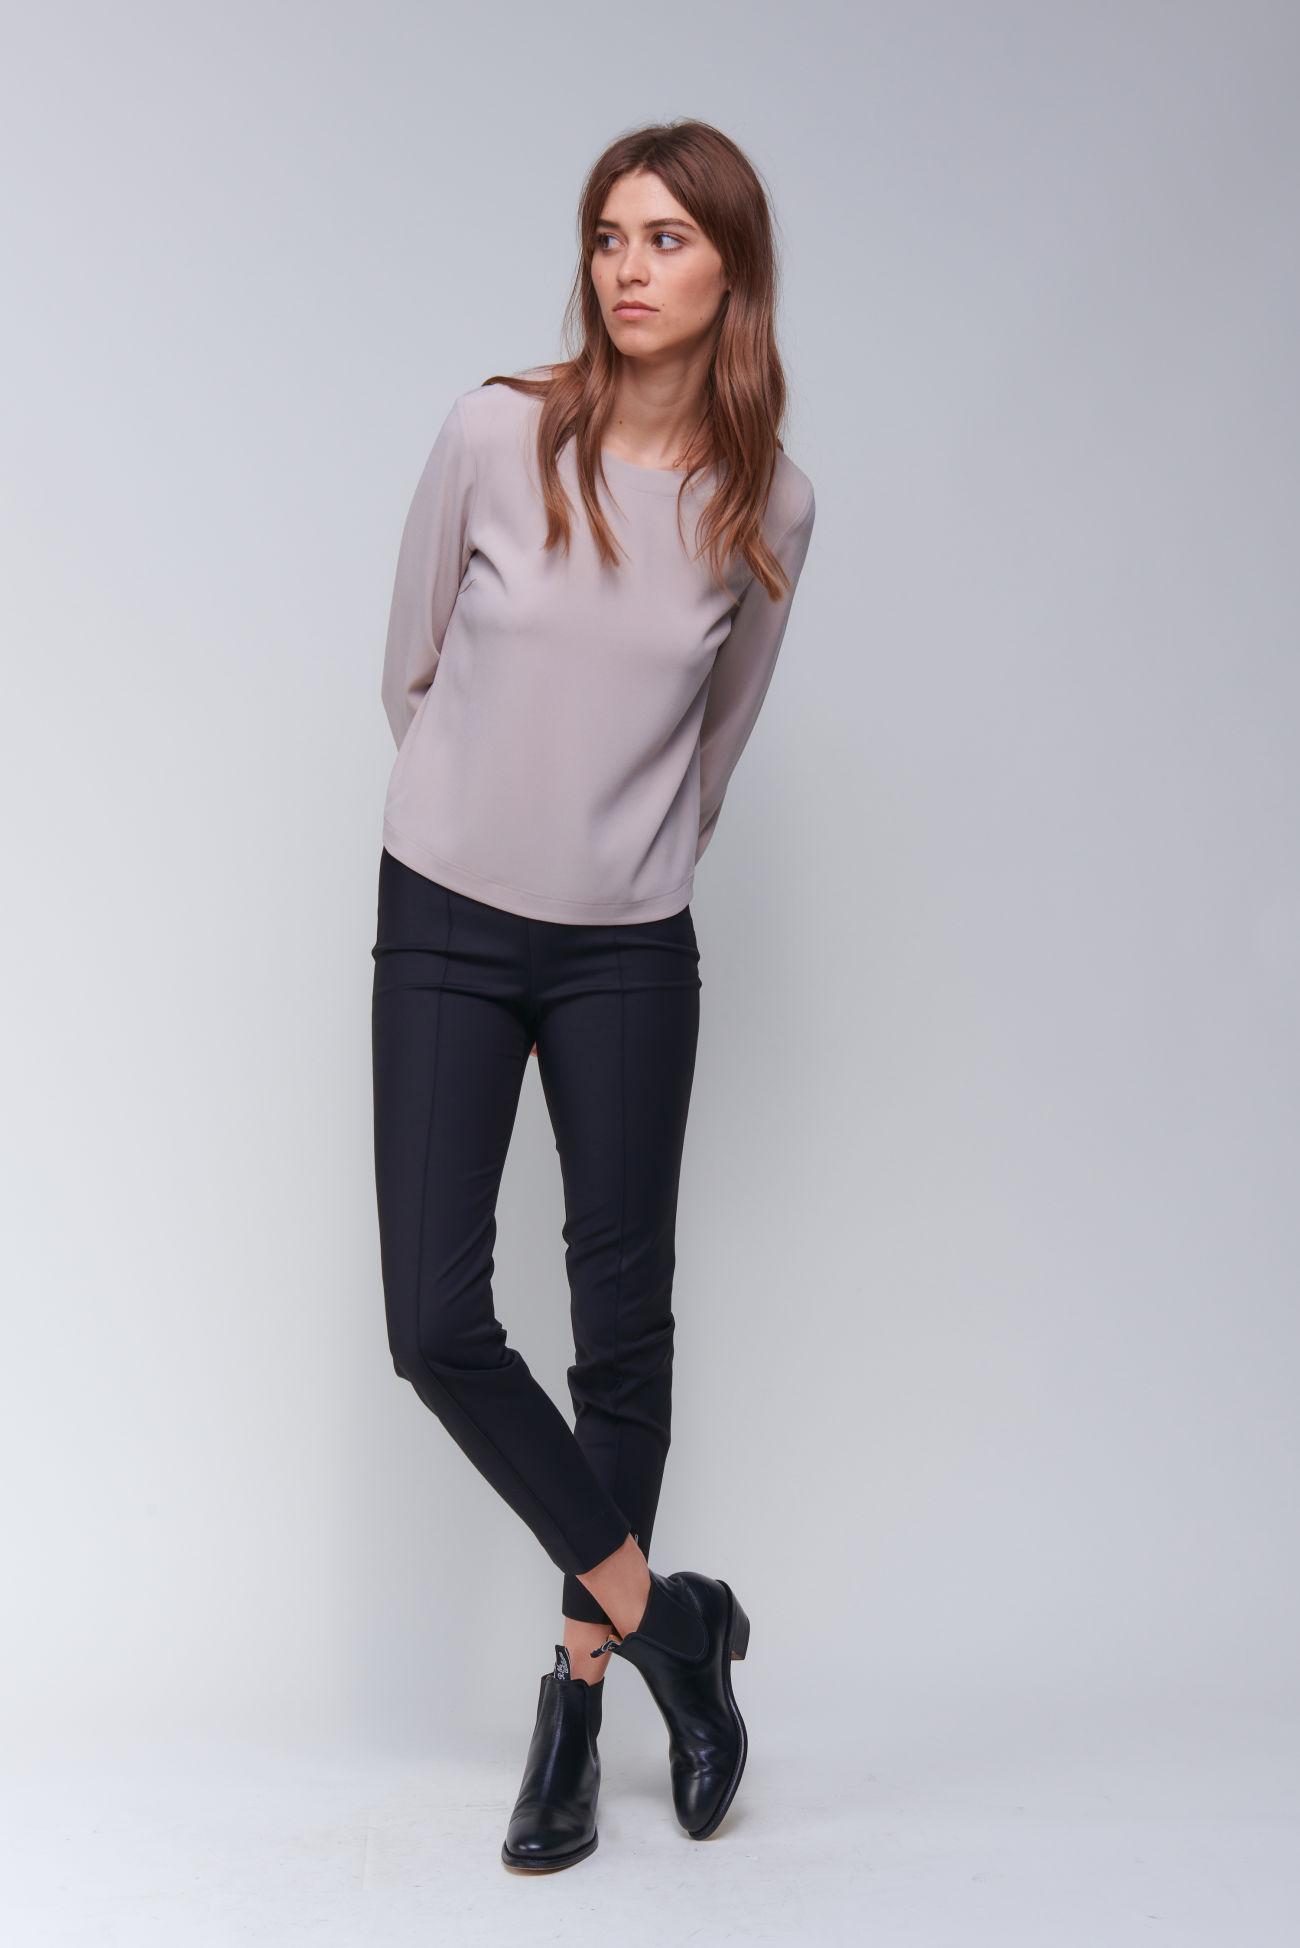 Vielseitig kombinierbare schmale Hose aus Double Poplin Stretch